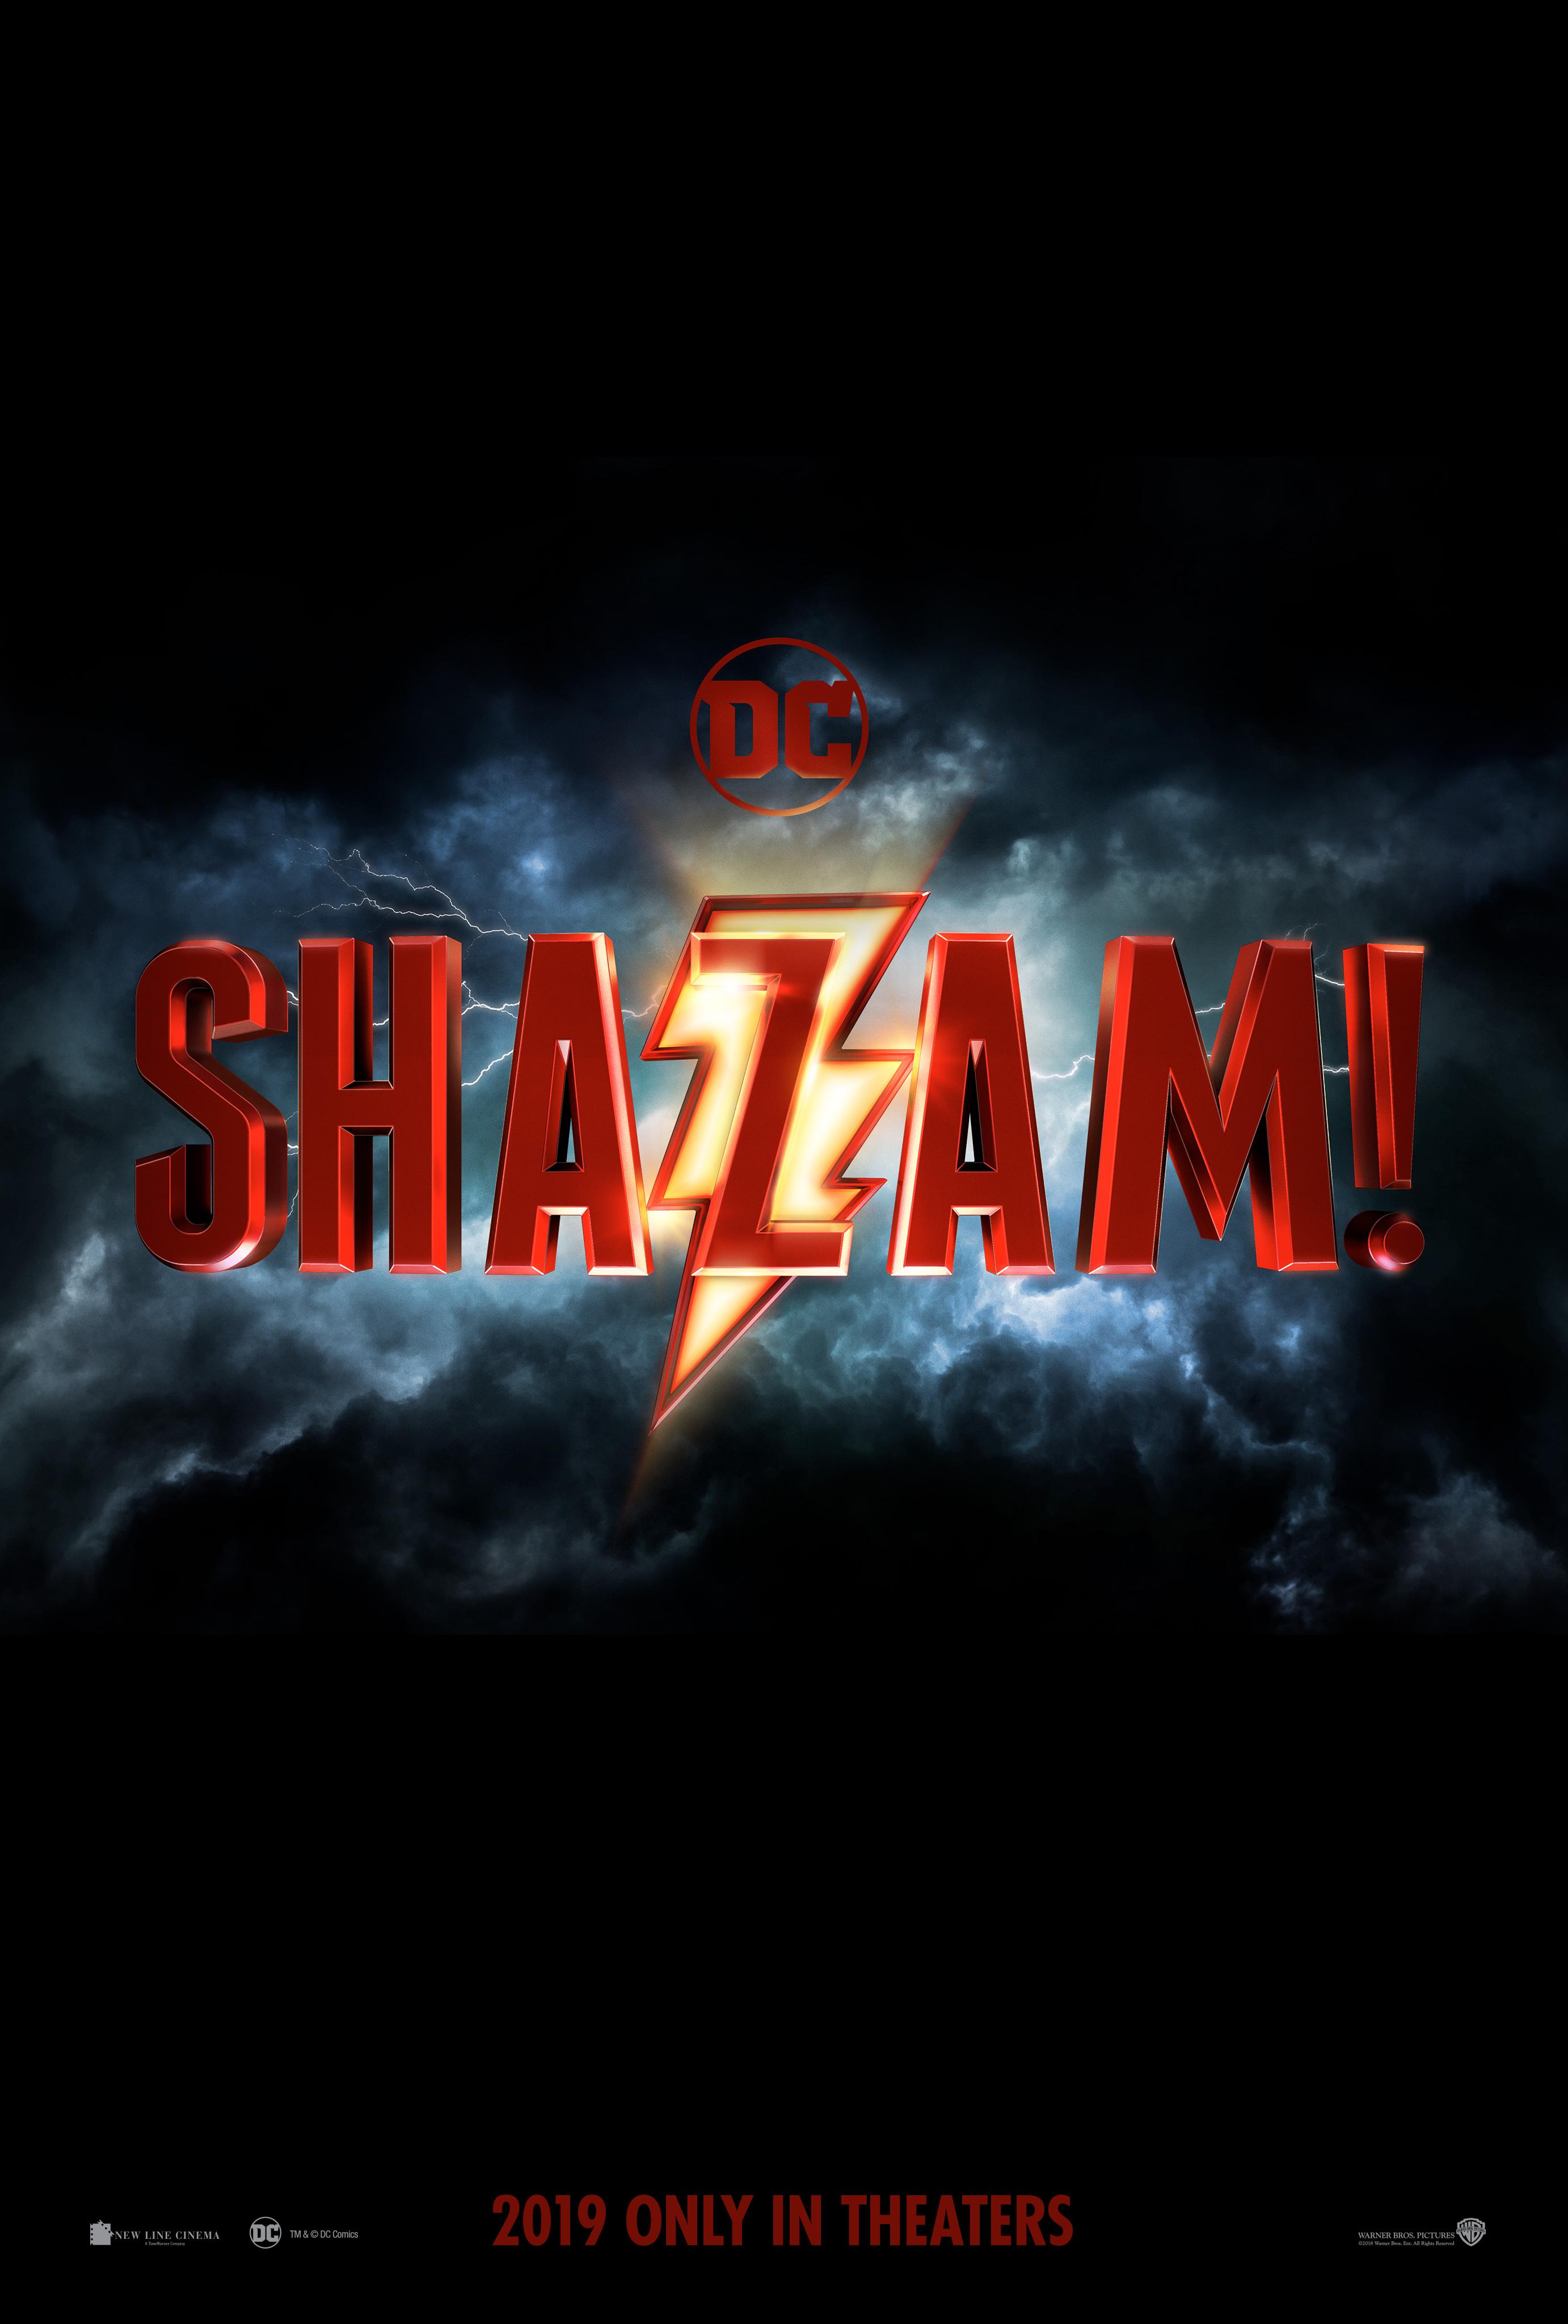 Shazam_TT_VERT_DOM_2764x4096_FIN_master.